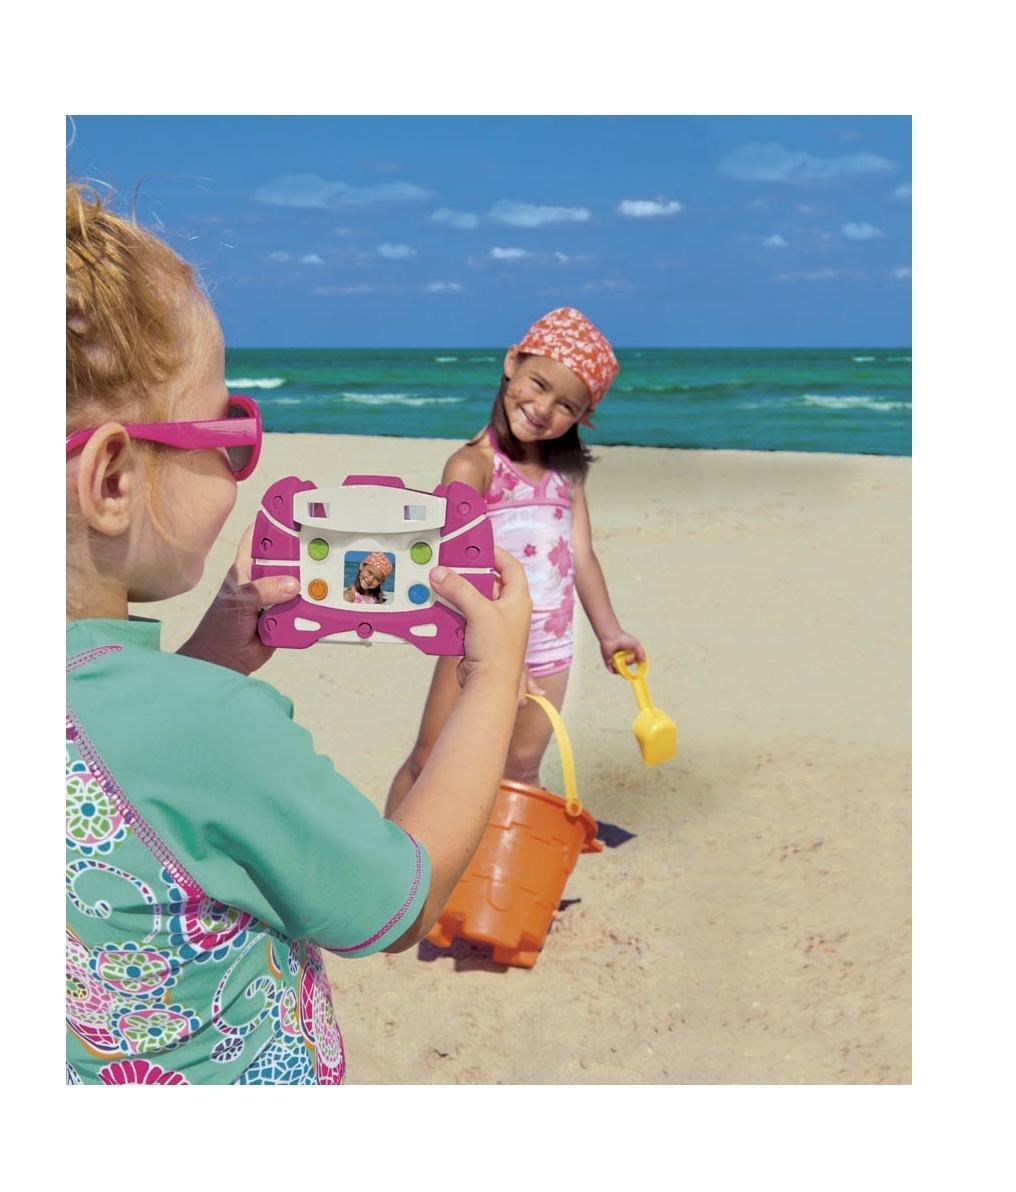 Fisher-Price Kid-Tough Digital Camera, Pink by Fisher-Price (Image #4)